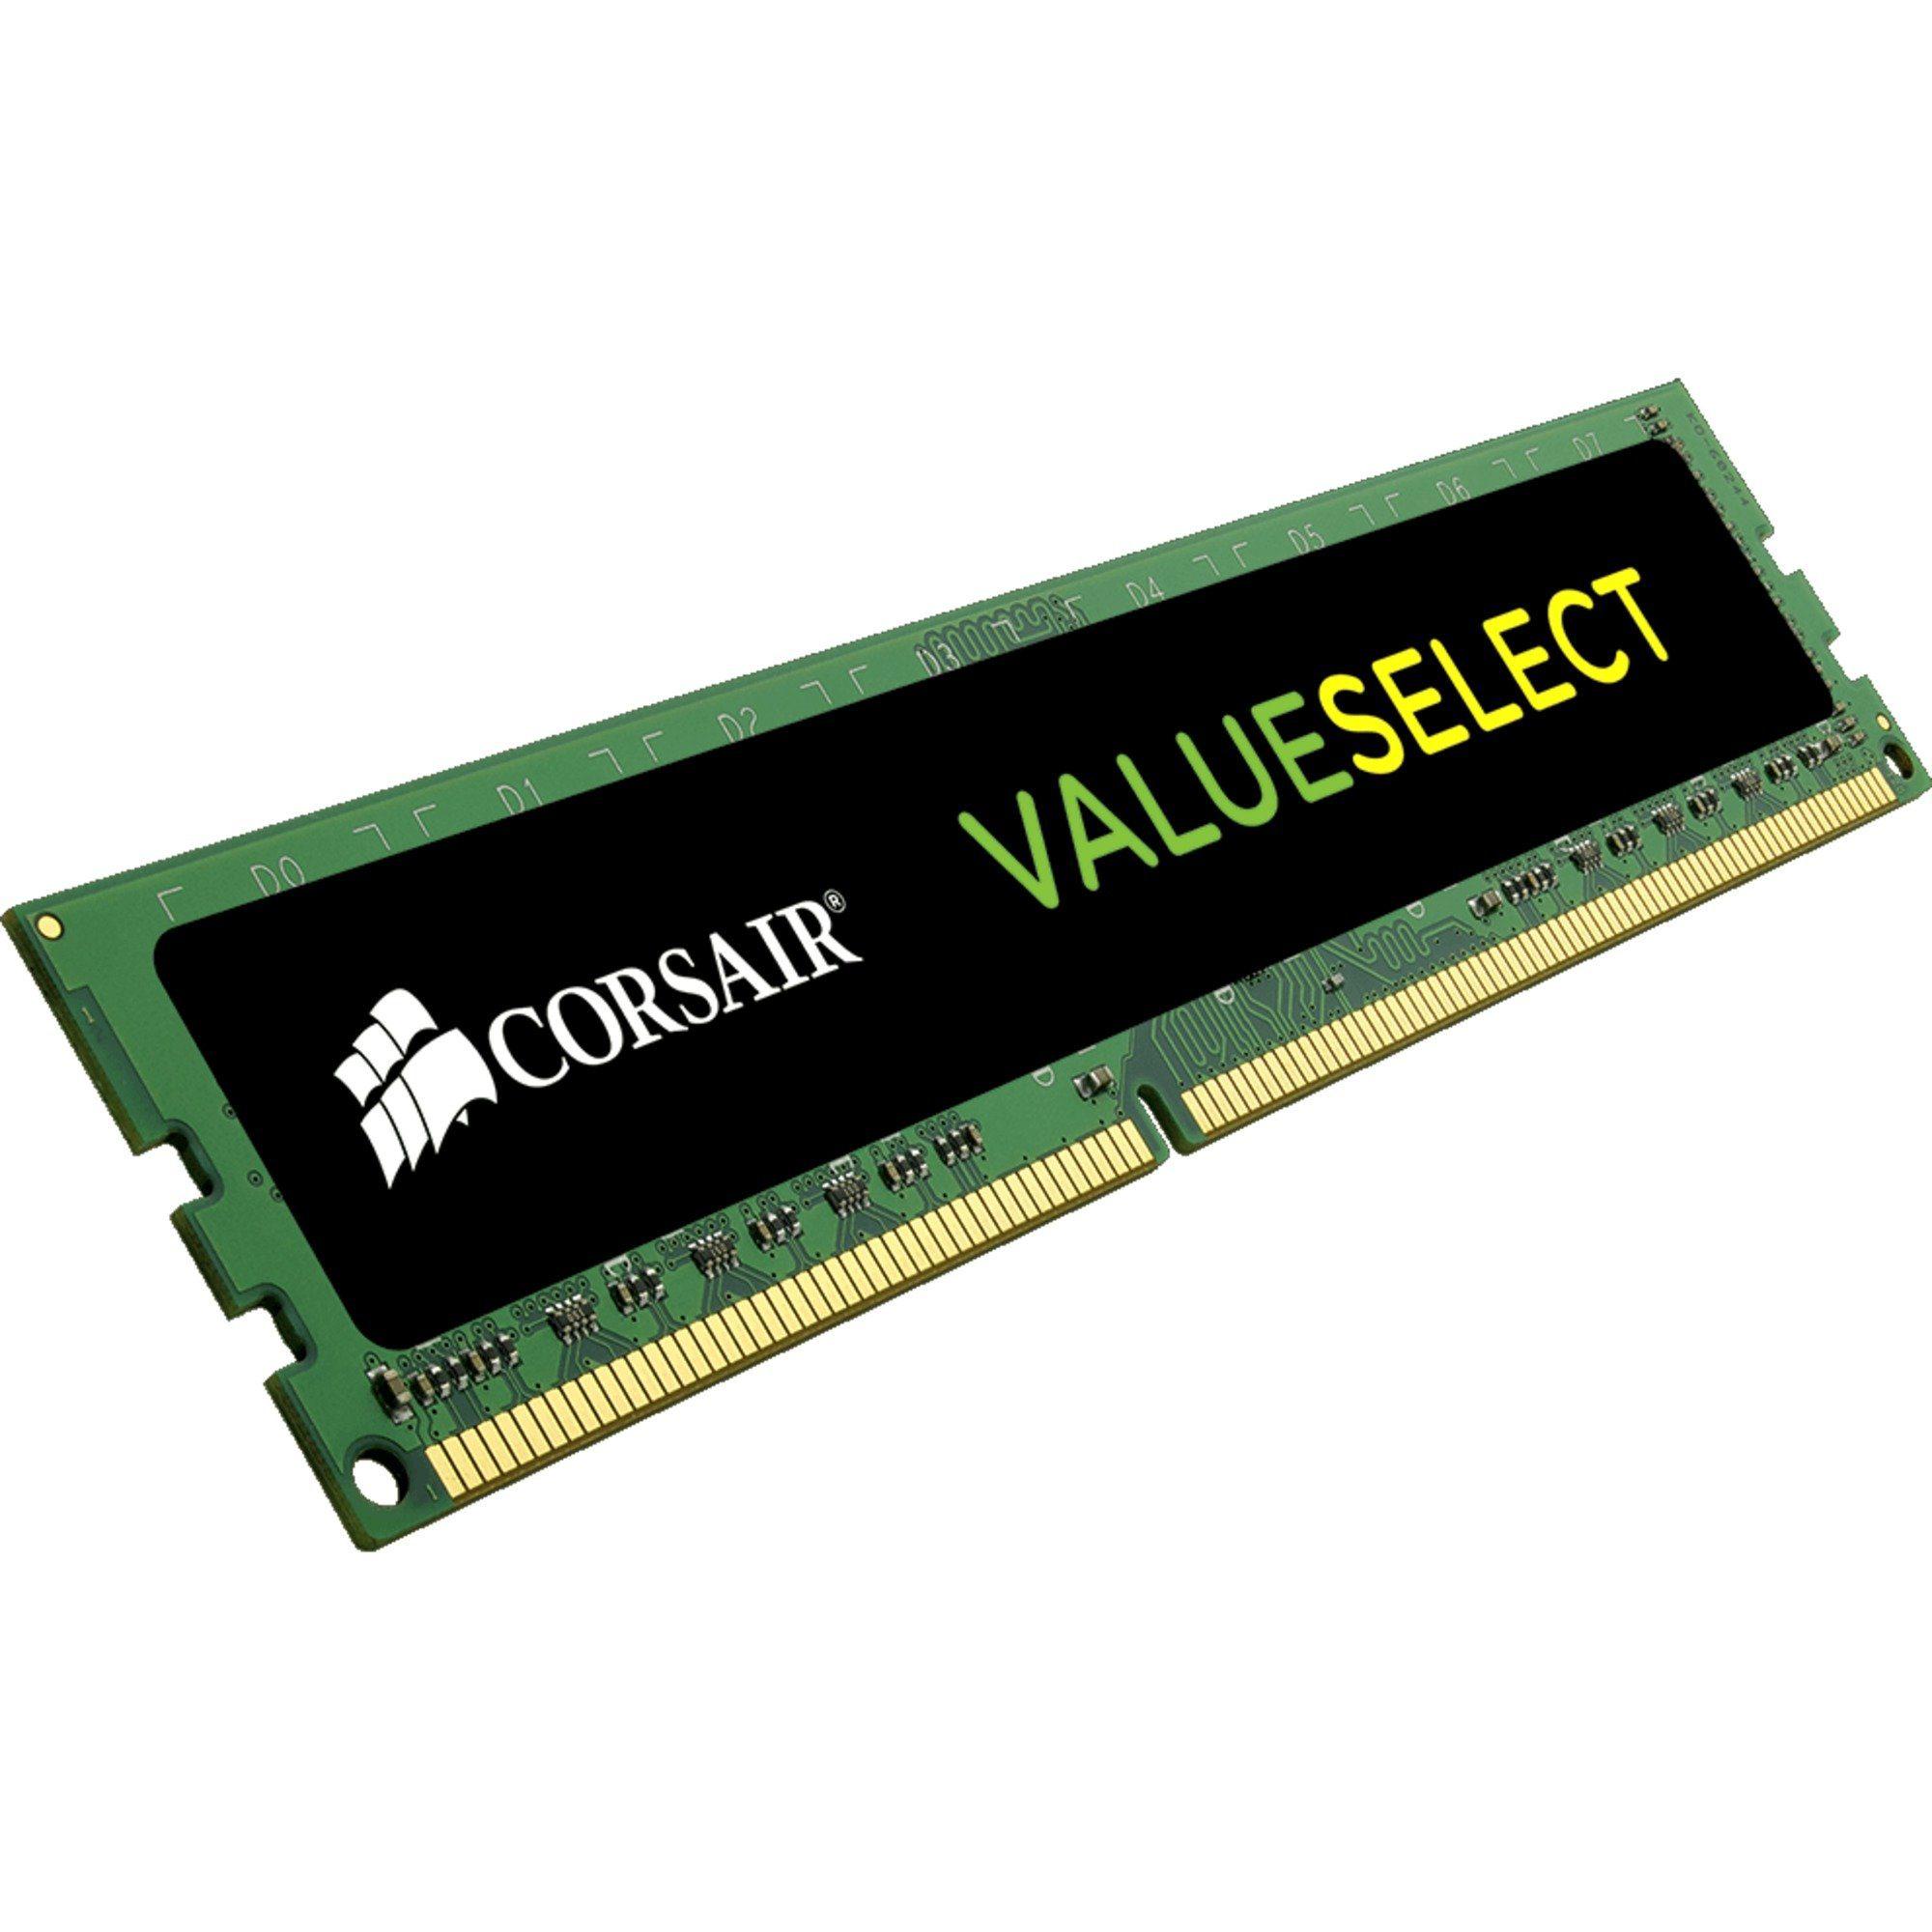 Corsair ValueSelect Arbeitsspeicher »DIMM 2GB DDR3L-1600, CMV2GX3M1C1600C11«